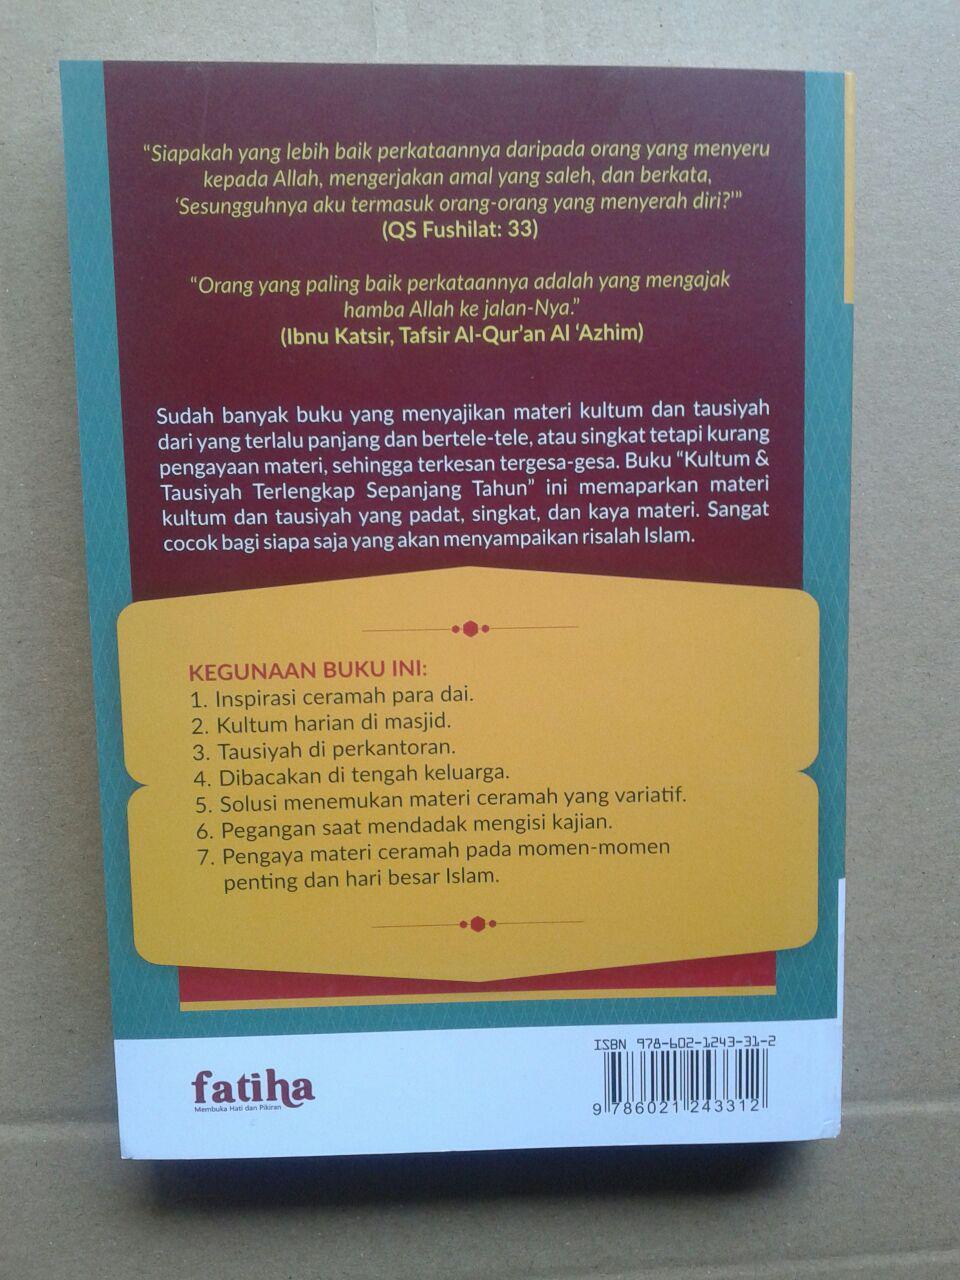 Buku Kultum Dan Tausiyah Terlengkap cover 2